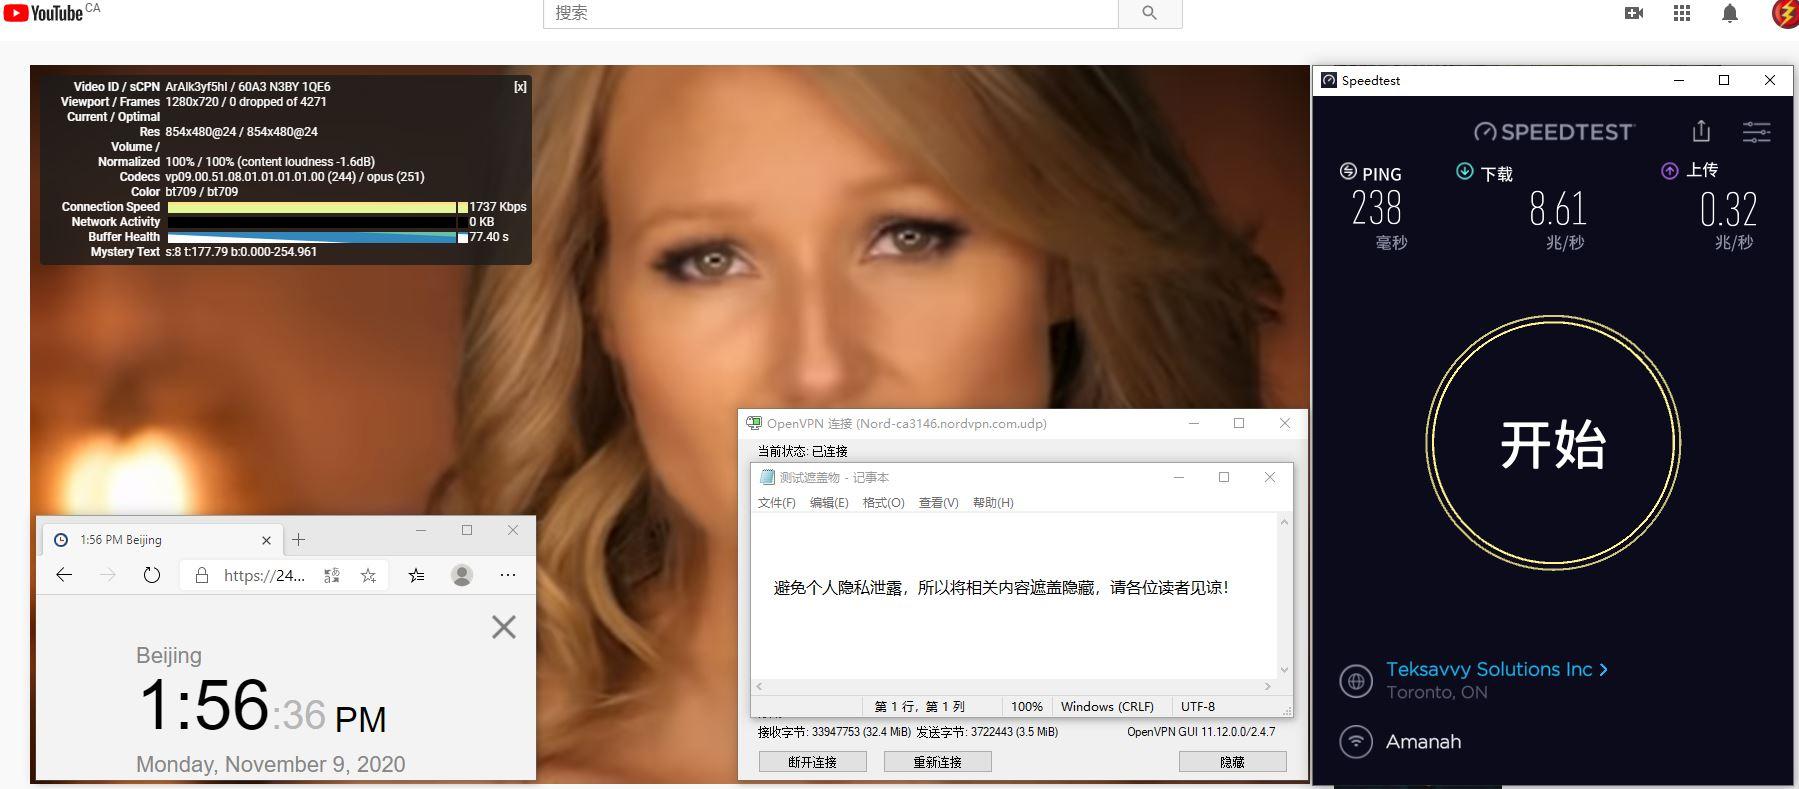 Windows10 NordVPN OpenVPN Gui ca3146 服务器 中国VPN 翻墙 科学上网 测试 - 20201109